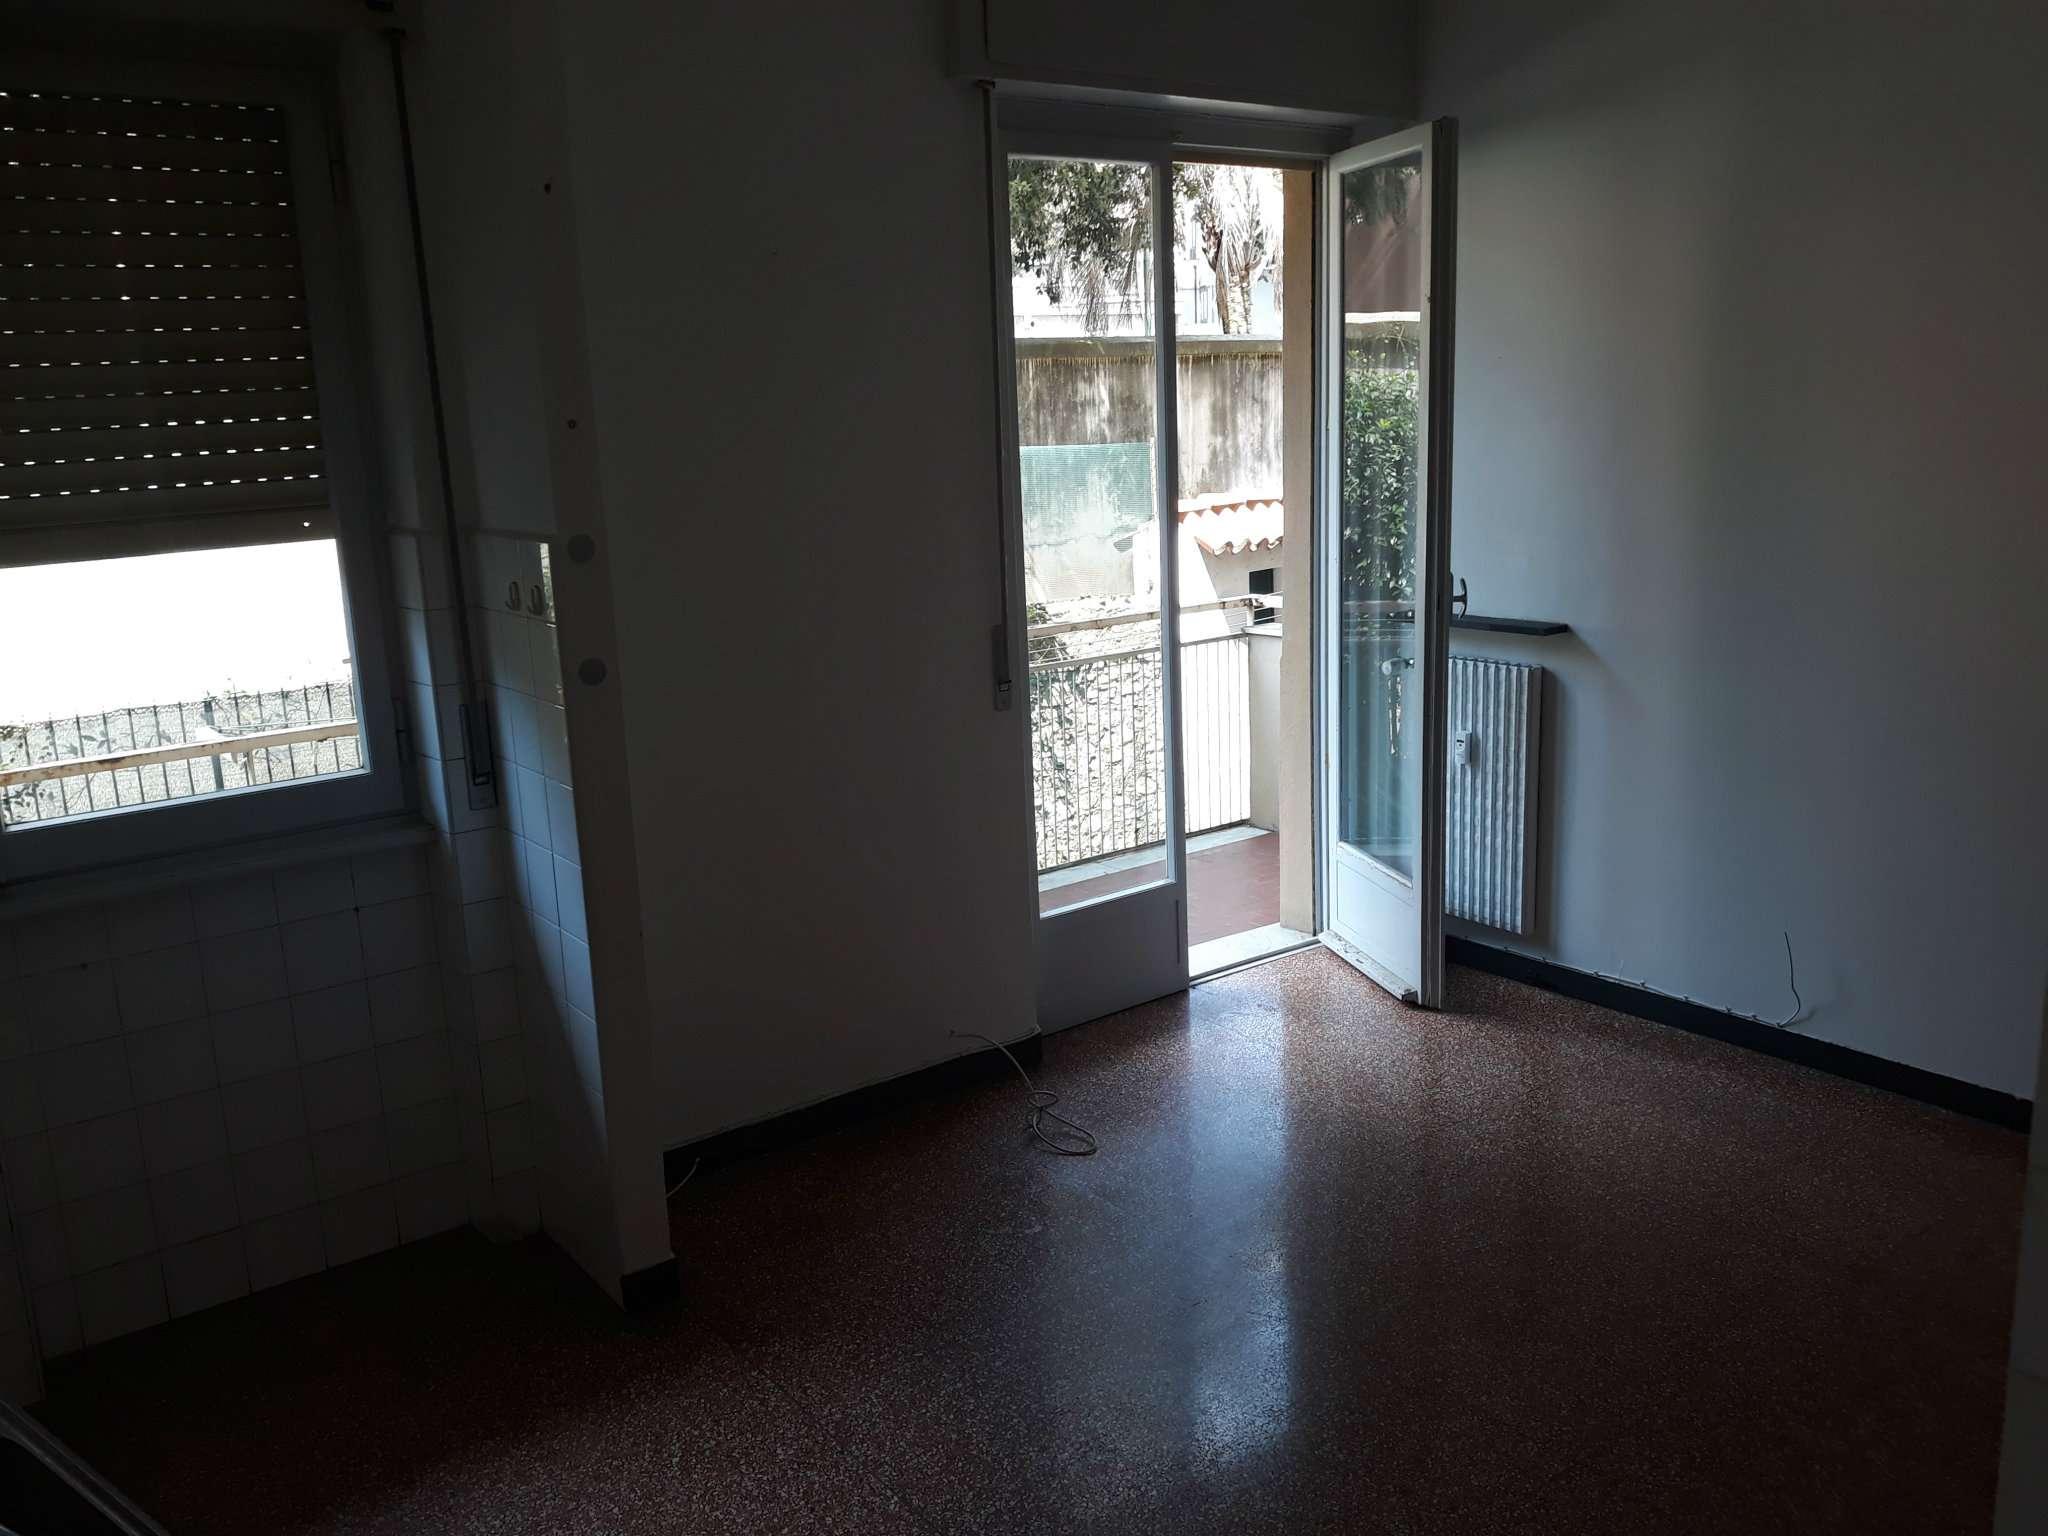 Foto 12 di Bilocale via carrara 128, Genova (zona Boccadasse-Sturla)